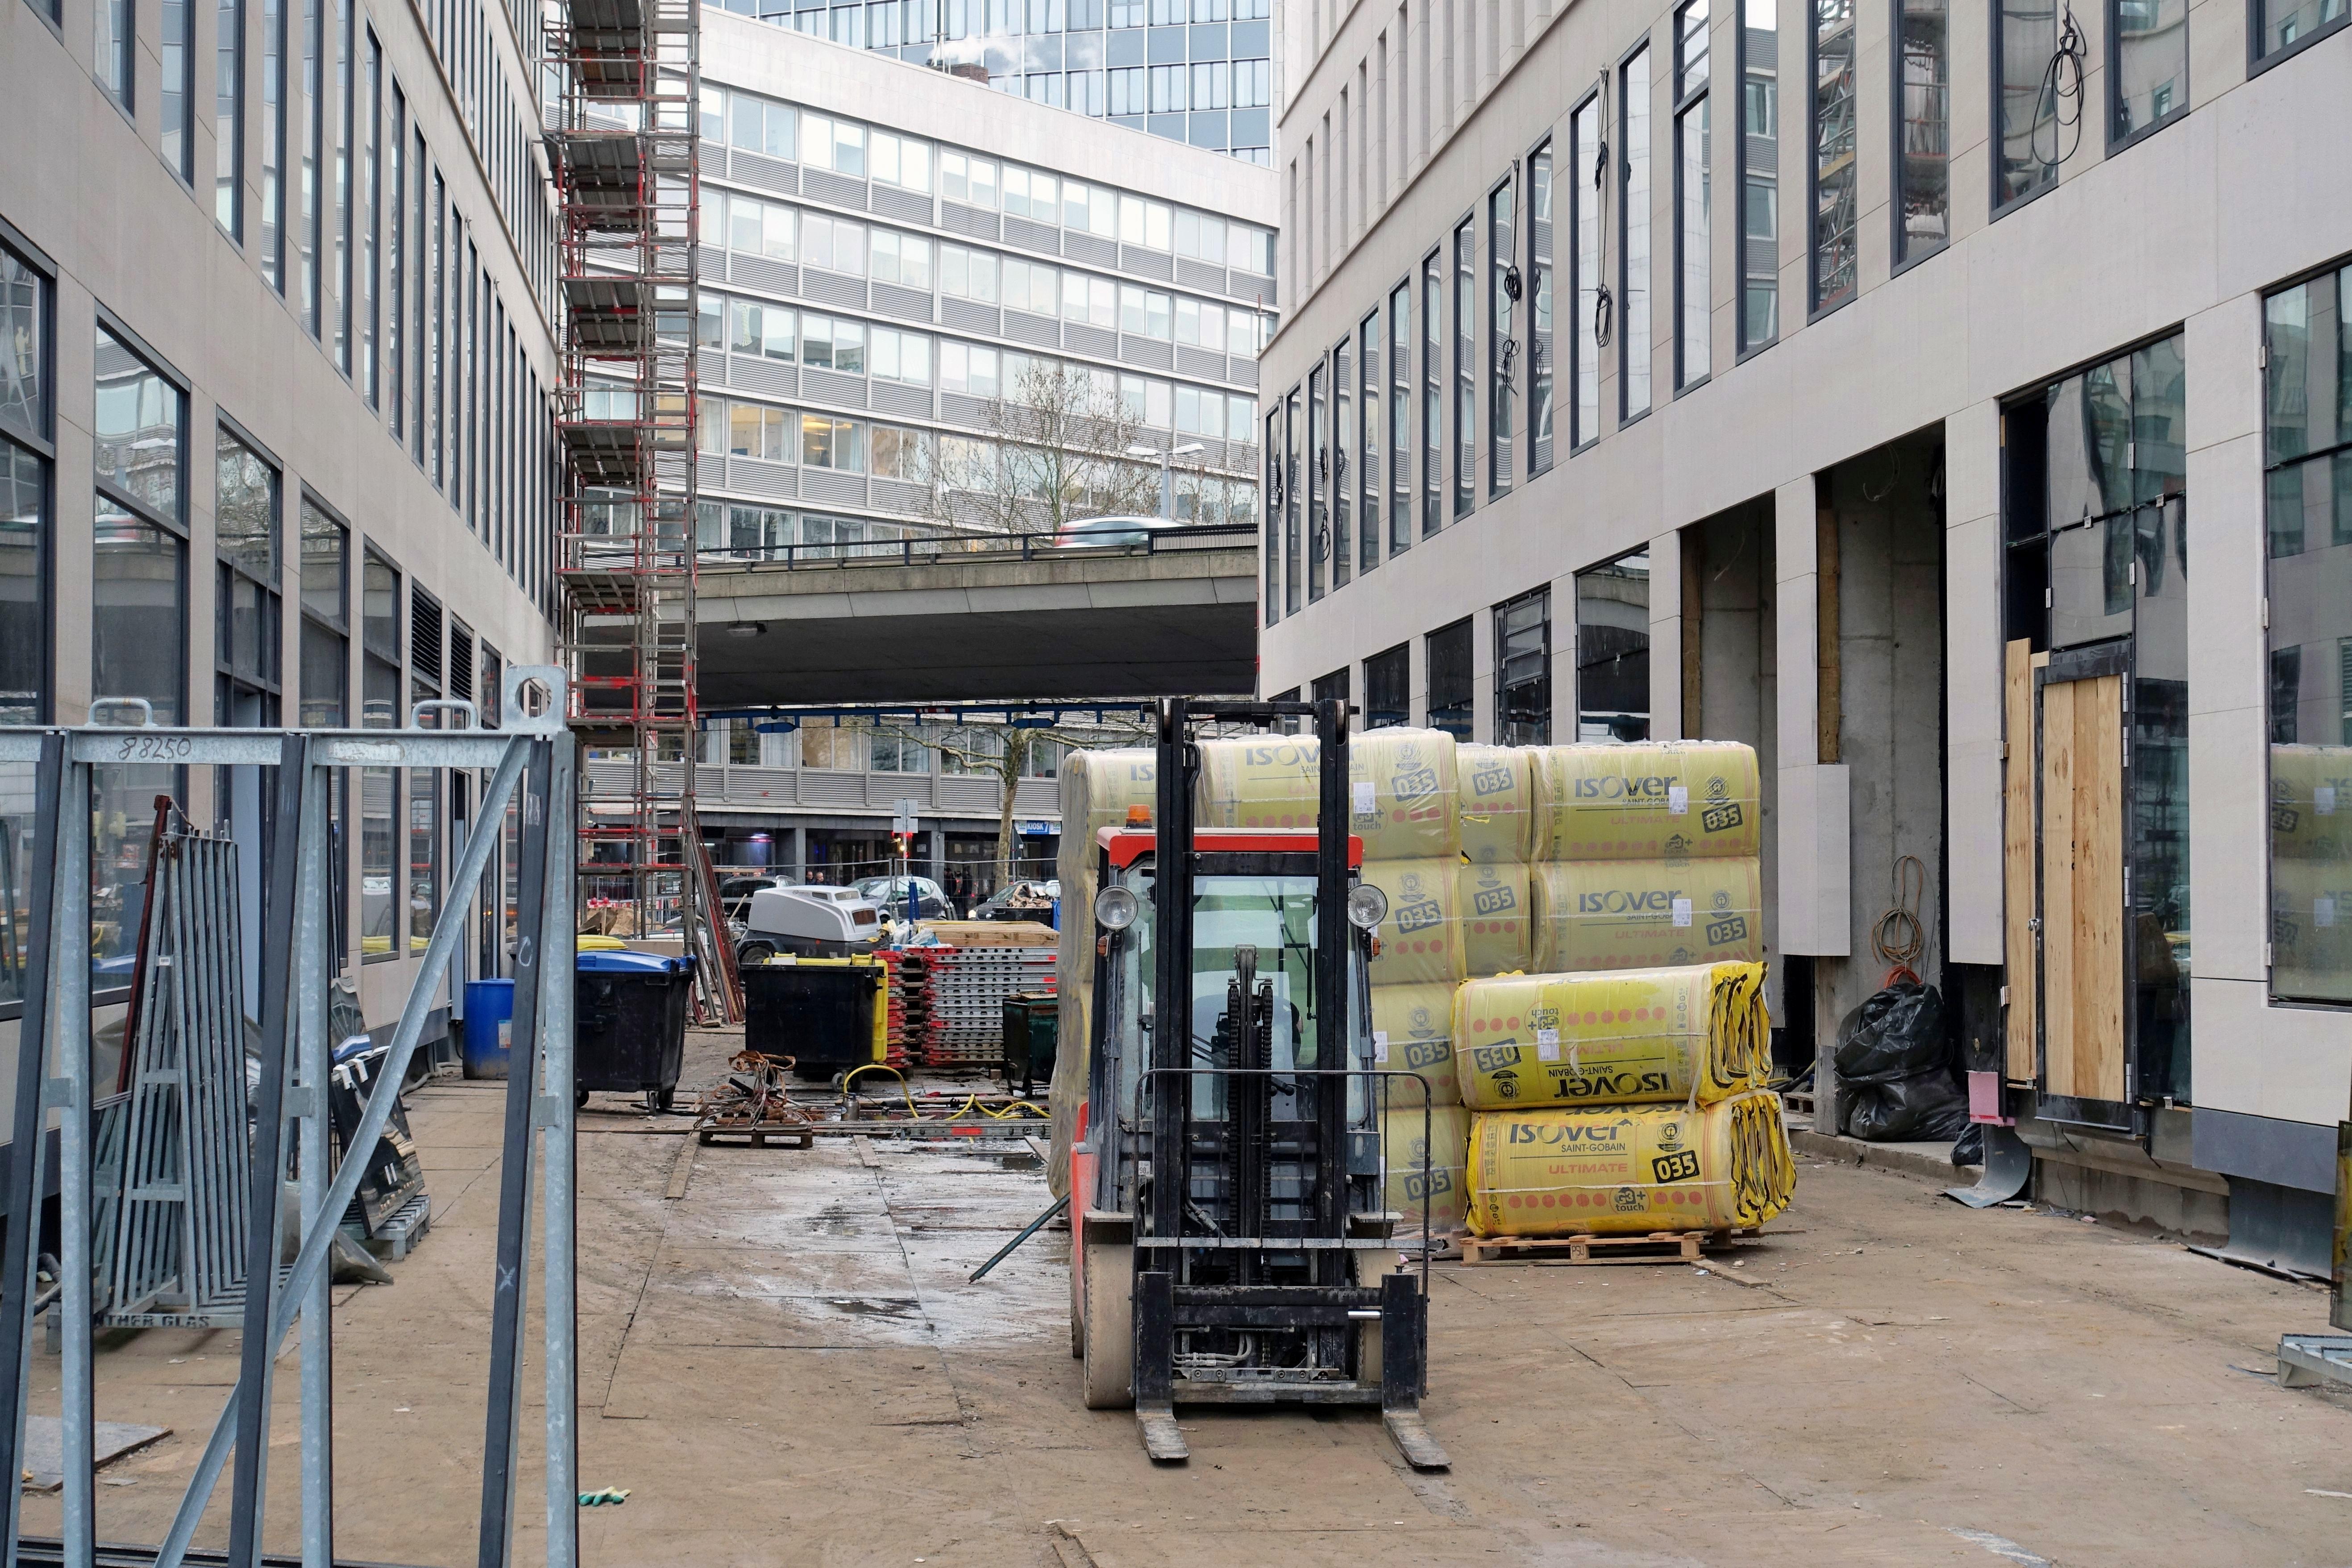 Baustelle Bahnhofsplatz 327